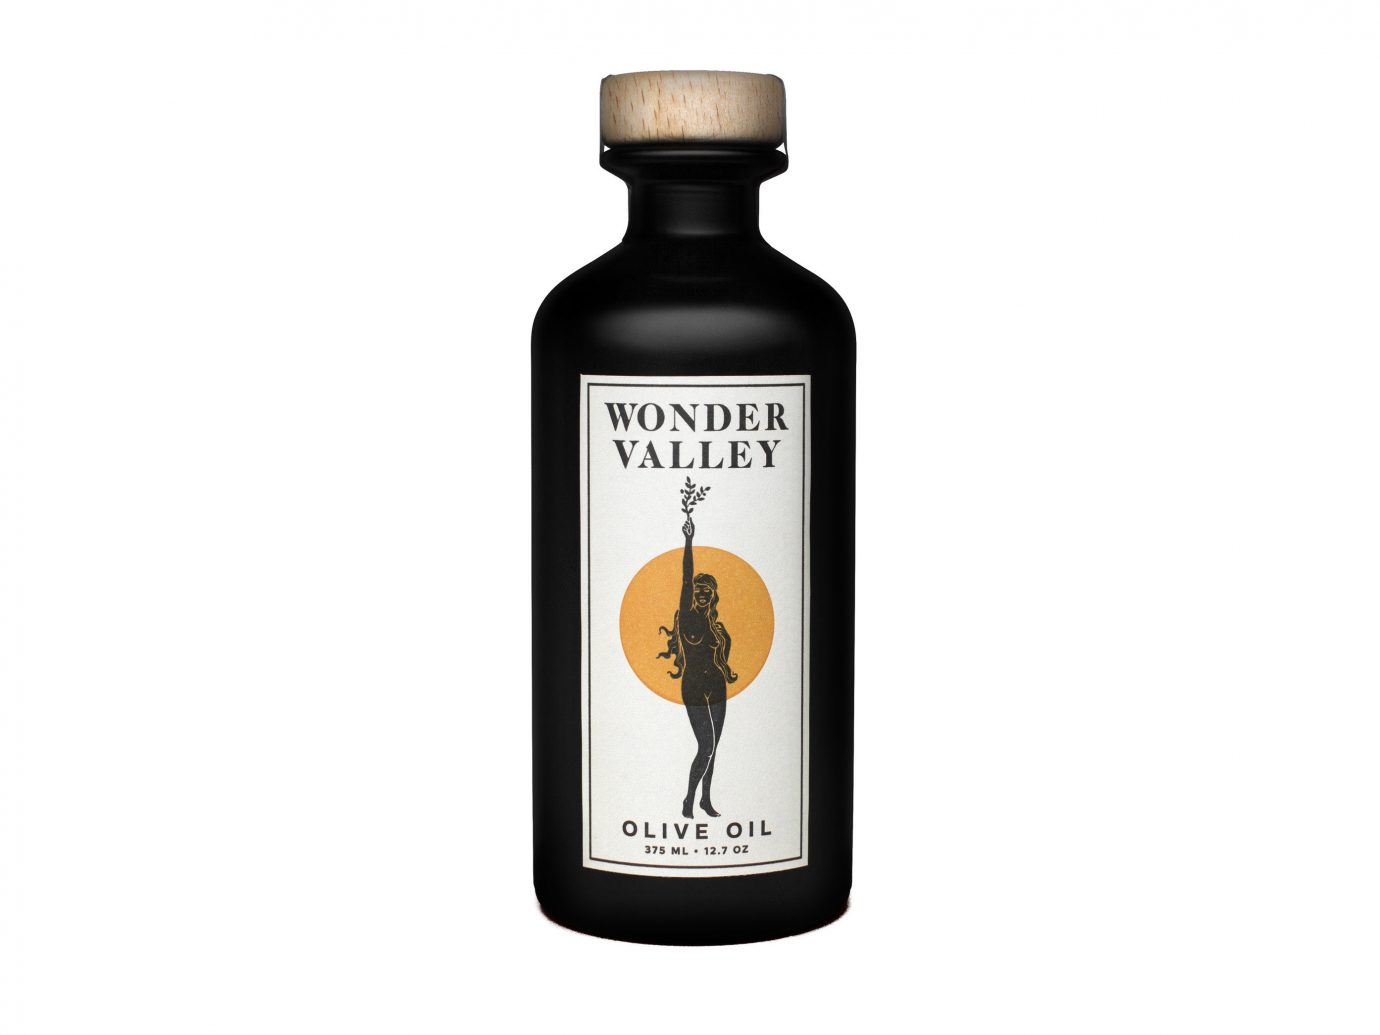 City Influencers + Tastemakers Joshua Tree liqueur distilled beverage bottle Drink product glass bottle alcohol